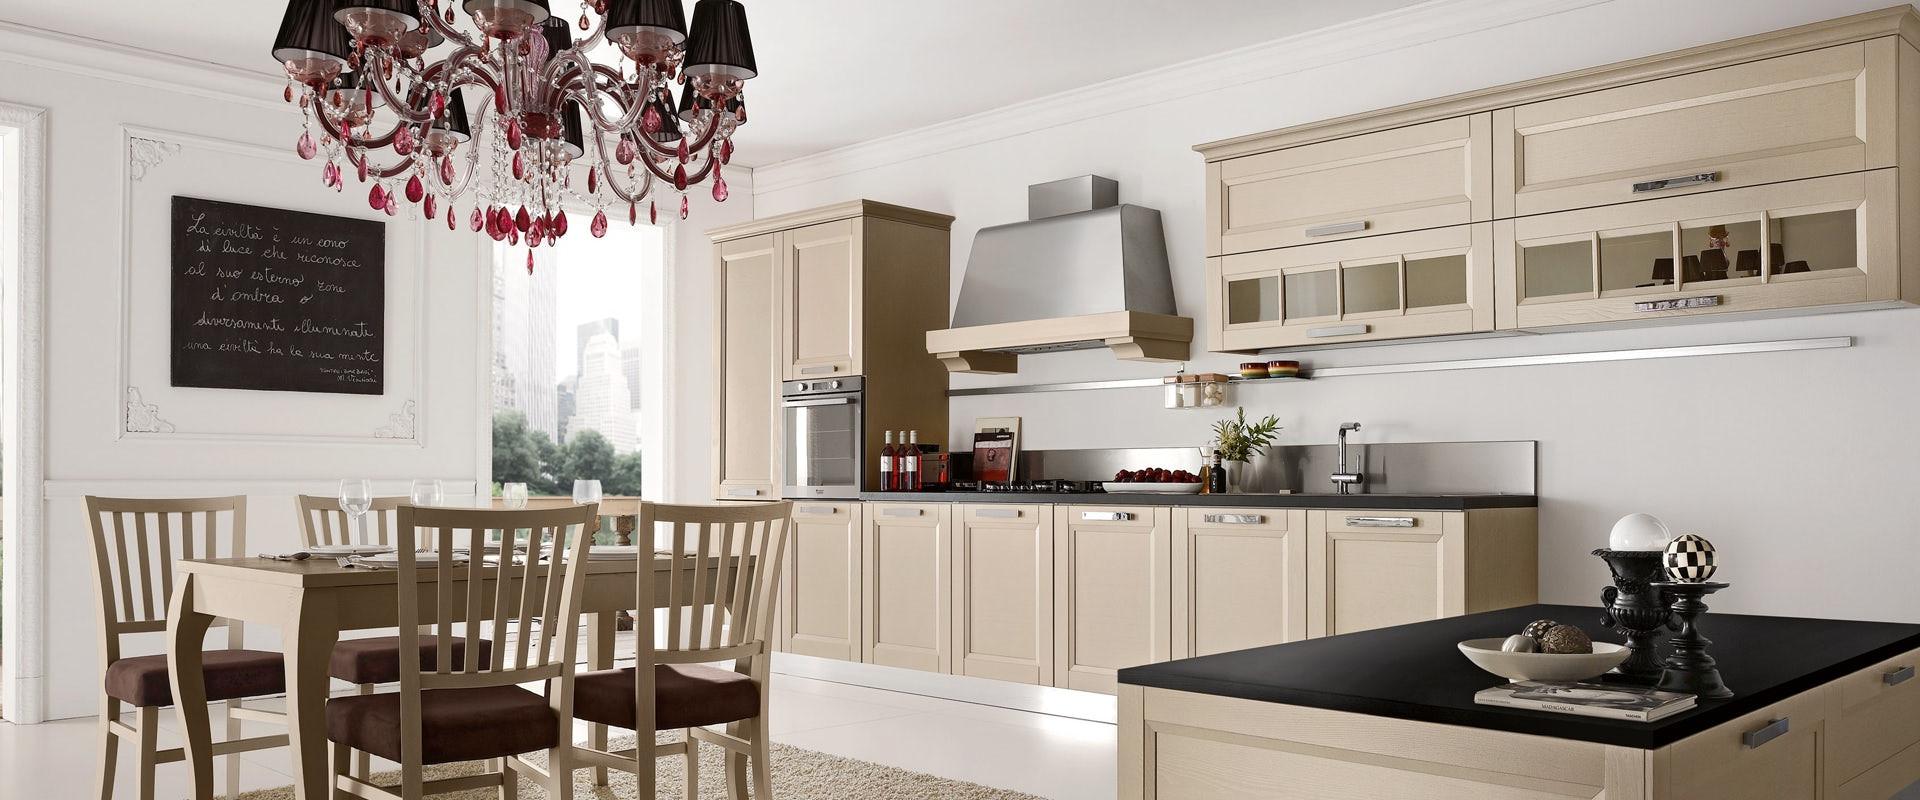 stosa-cucine-classiche-beverly-184.jpg